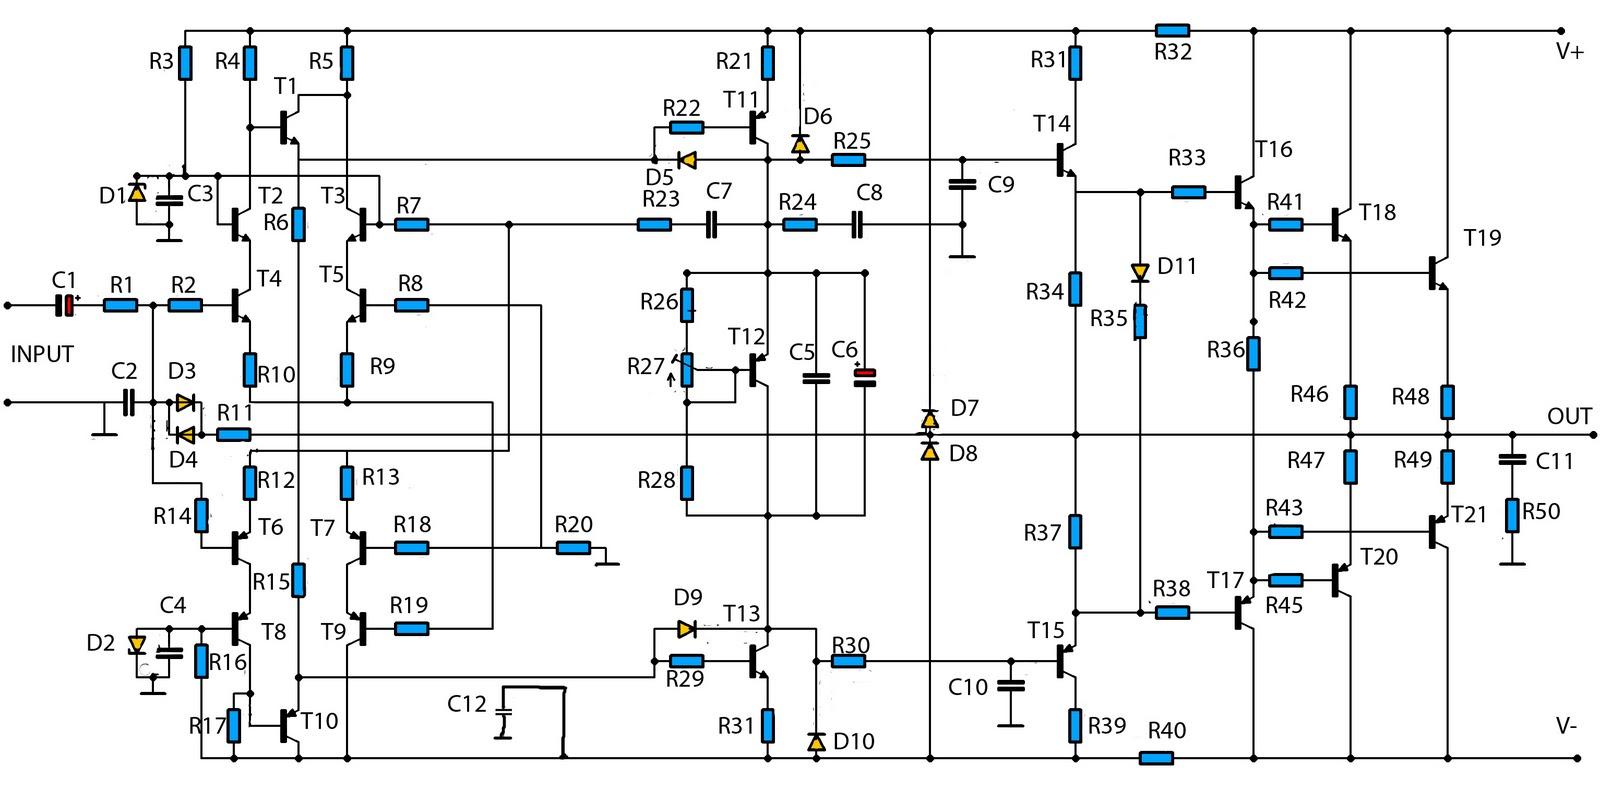 schematic power amplifier wiring diagrams power amplifier product 1400w audio power amplifier circuit diagram peavey [ 1600 x 790 Pixel ]